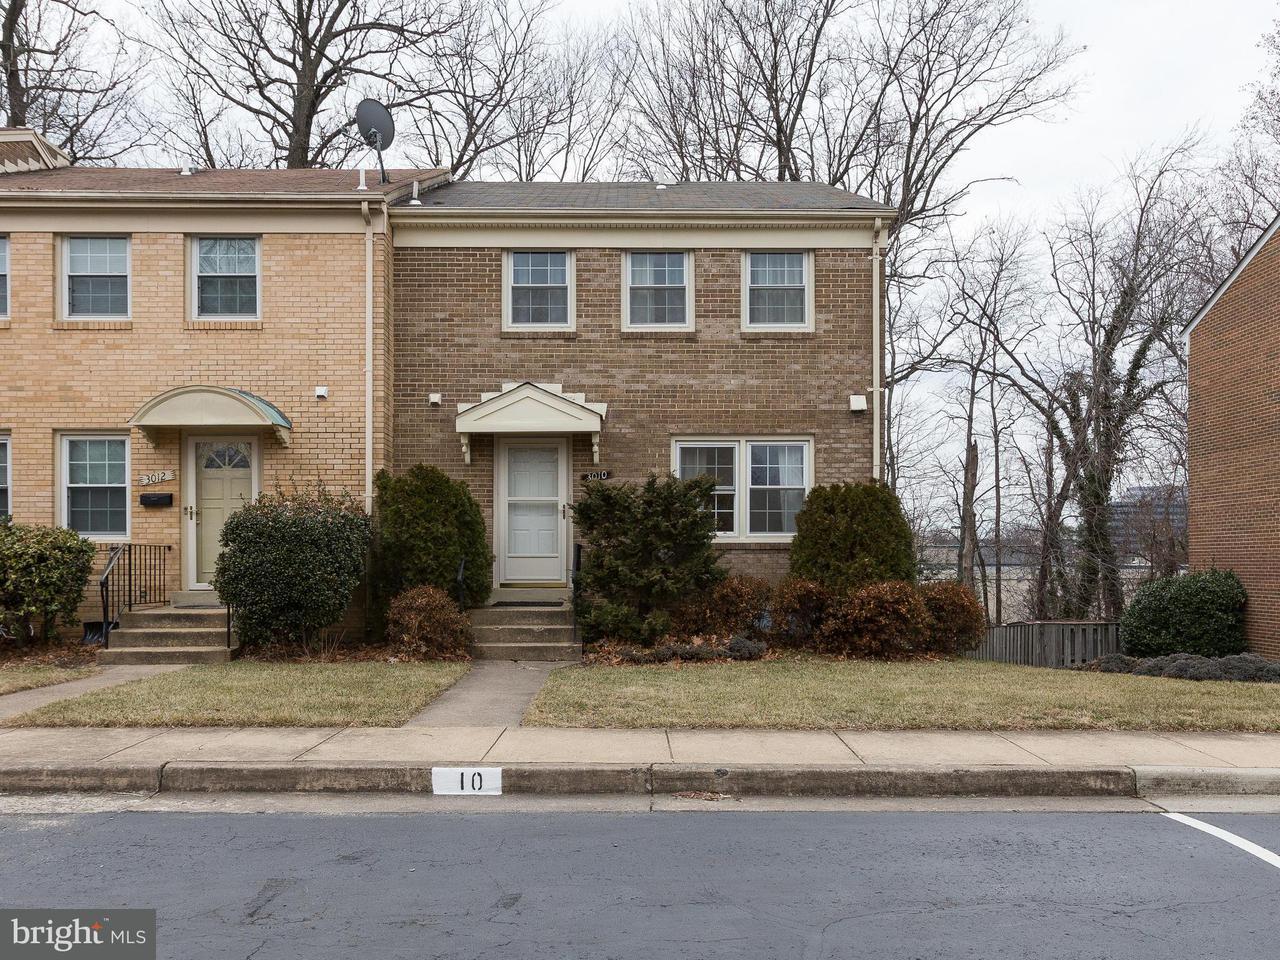 Townhouse for Sale at 3010 Covington Street 3010 Covington Street Fairfax, Virginia 22031 United States